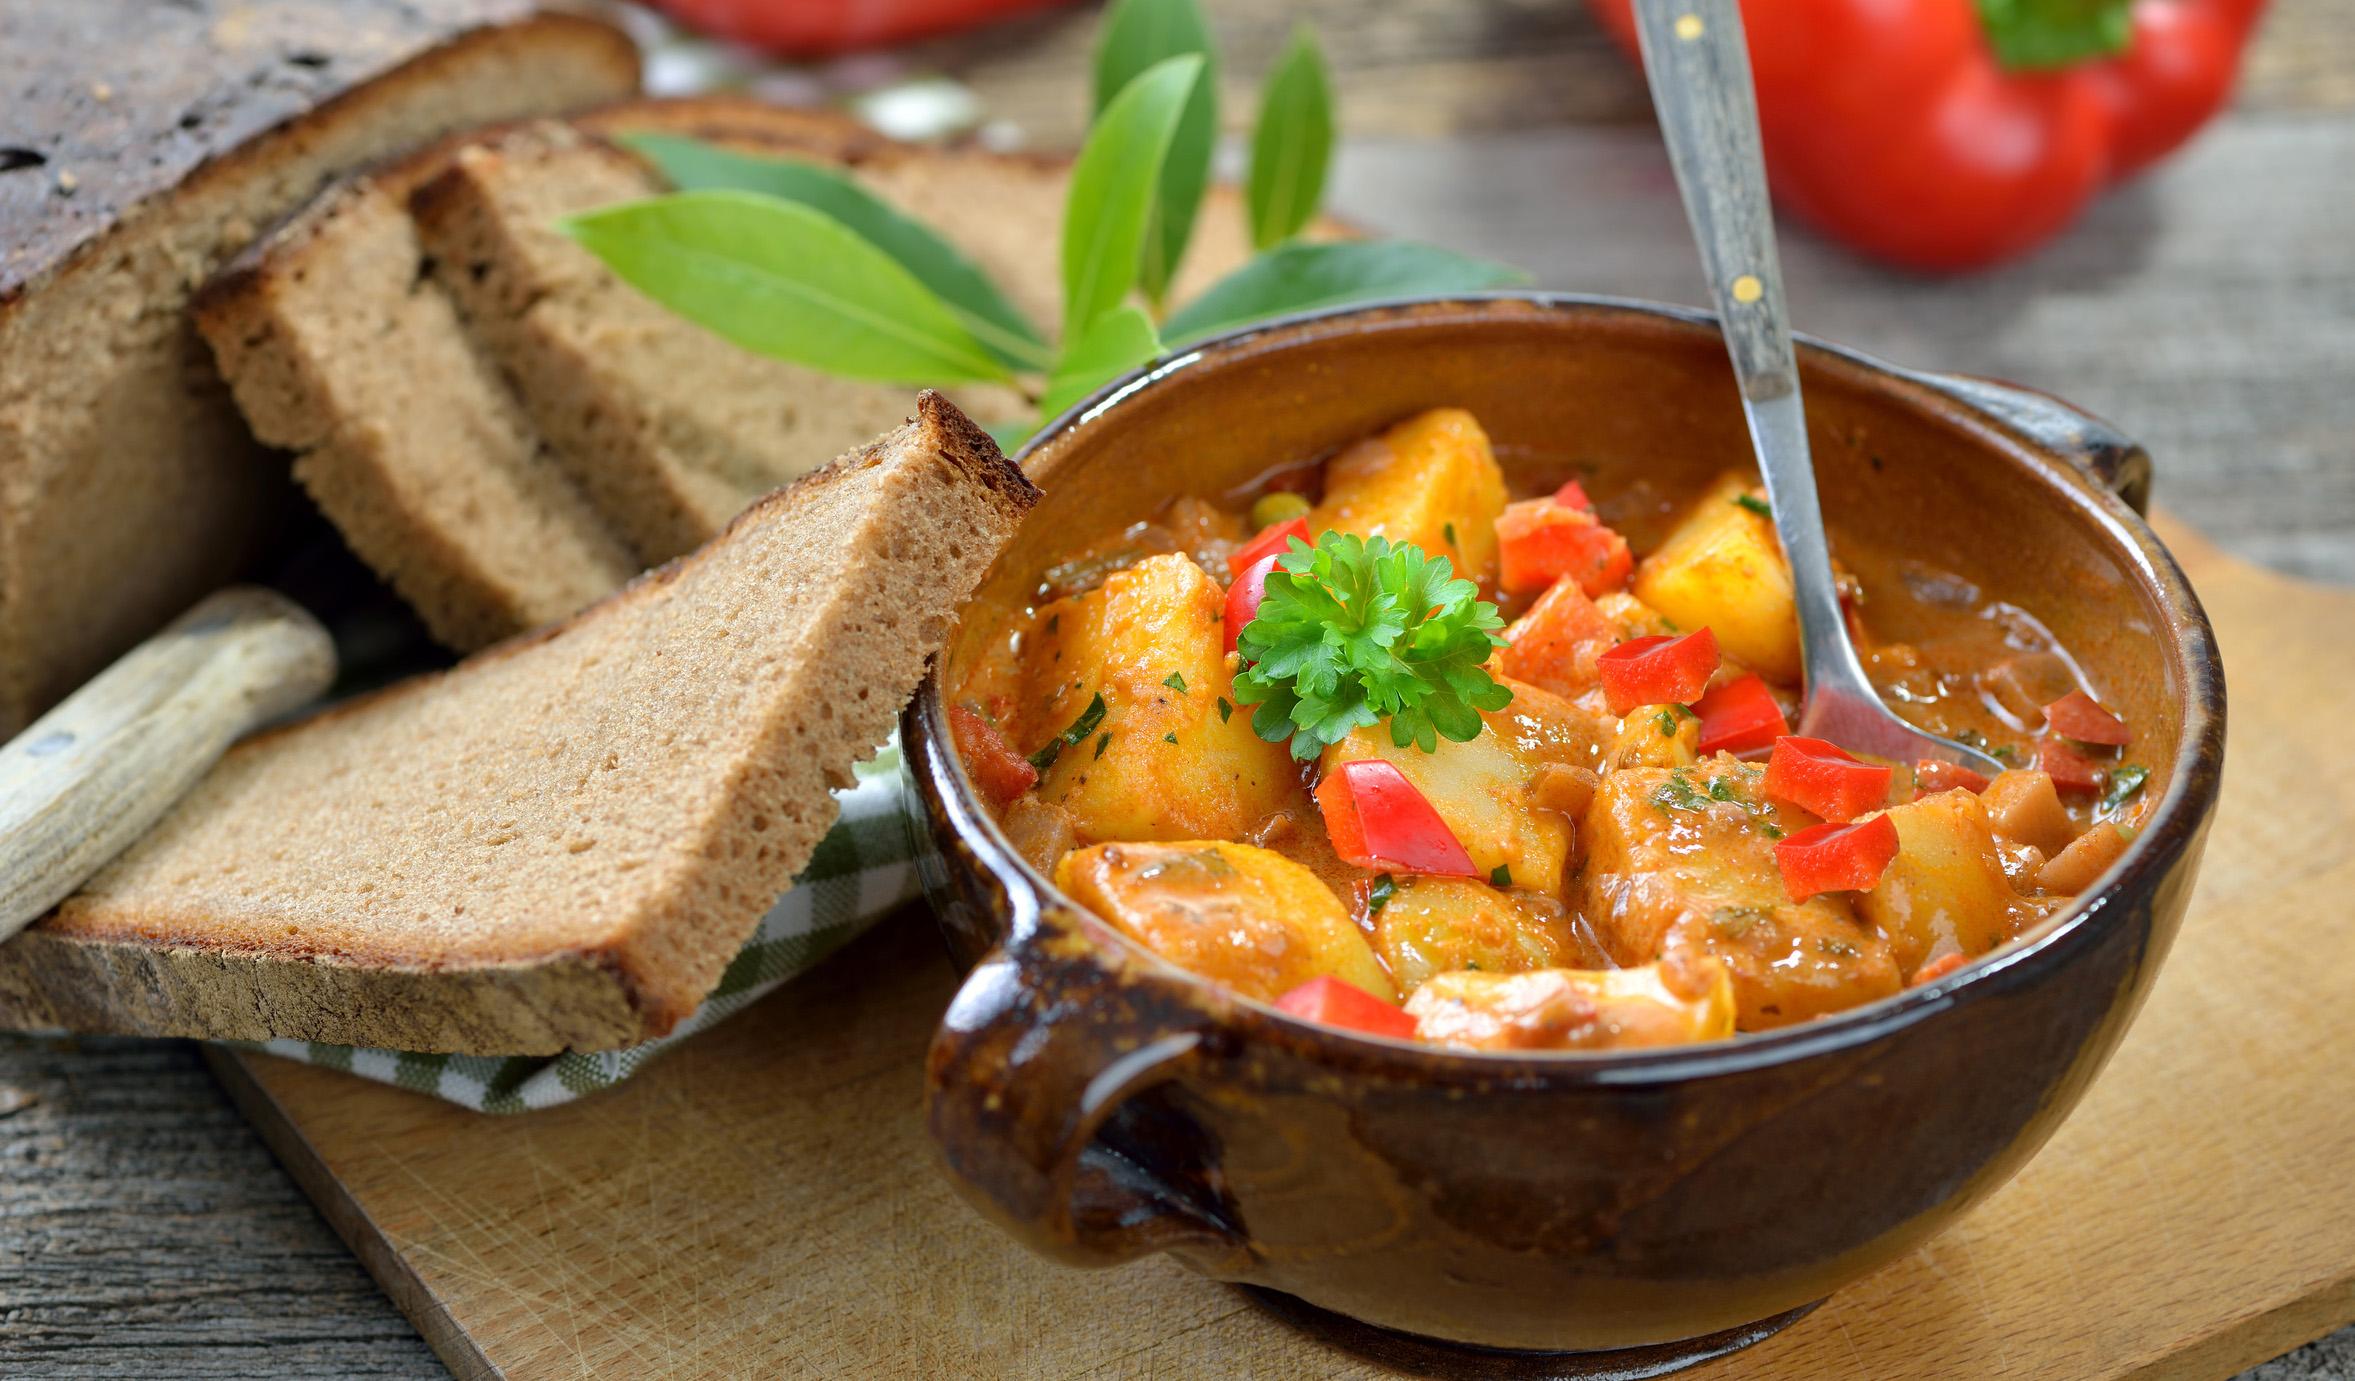 Deftiger Kartoffel-Gemüse-Eintopf